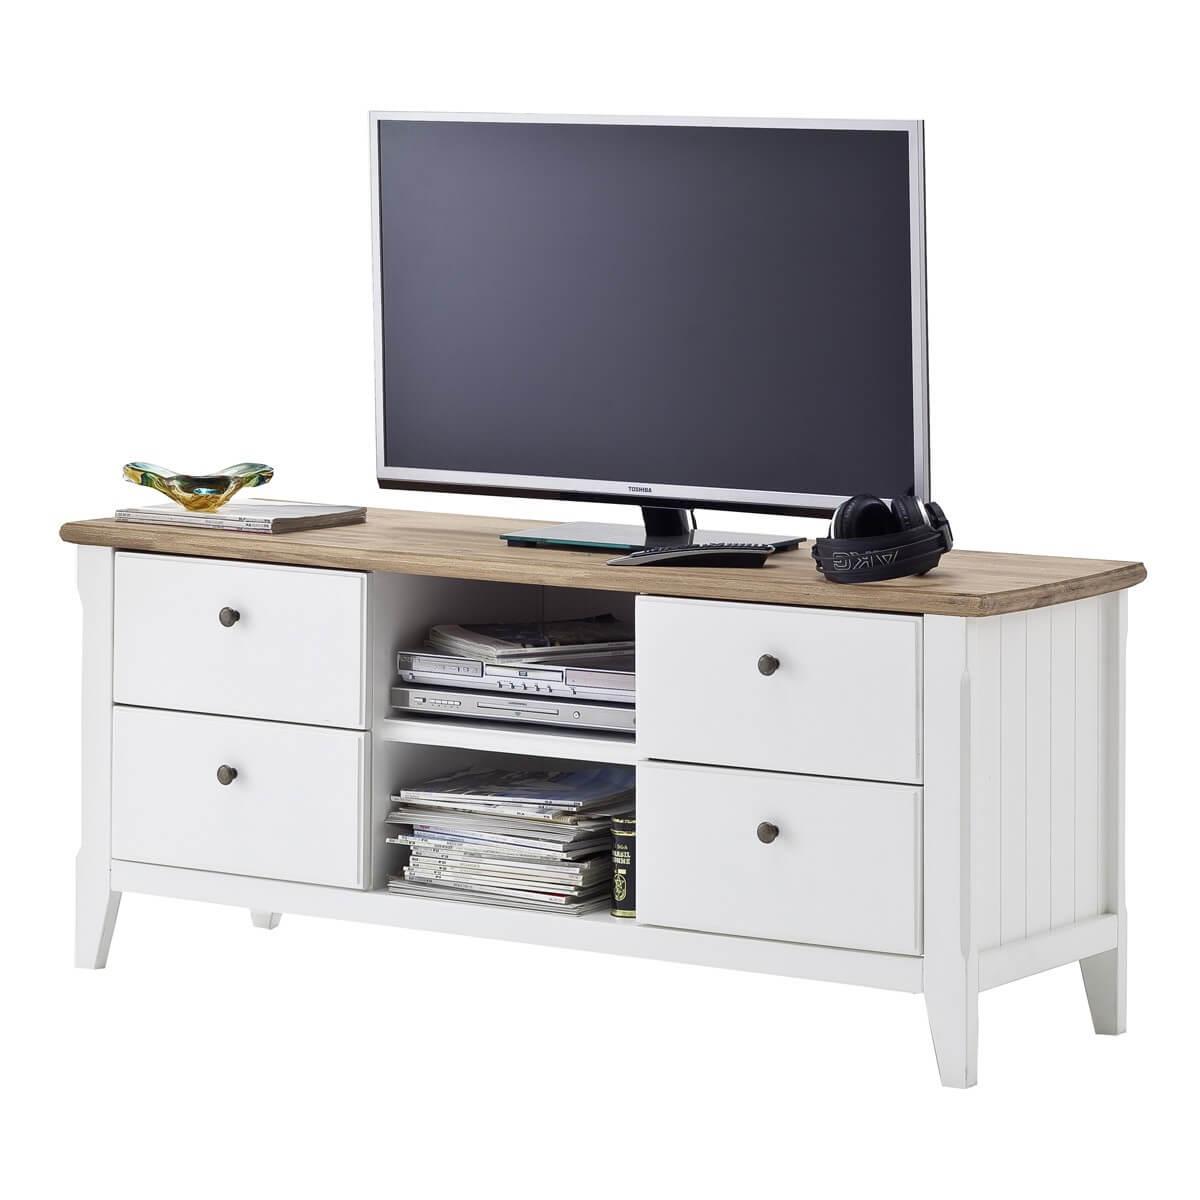 tv lowboard in wei naturfarbig 154cm breit m bel24. Black Bedroom Furniture Sets. Home Design Ideas